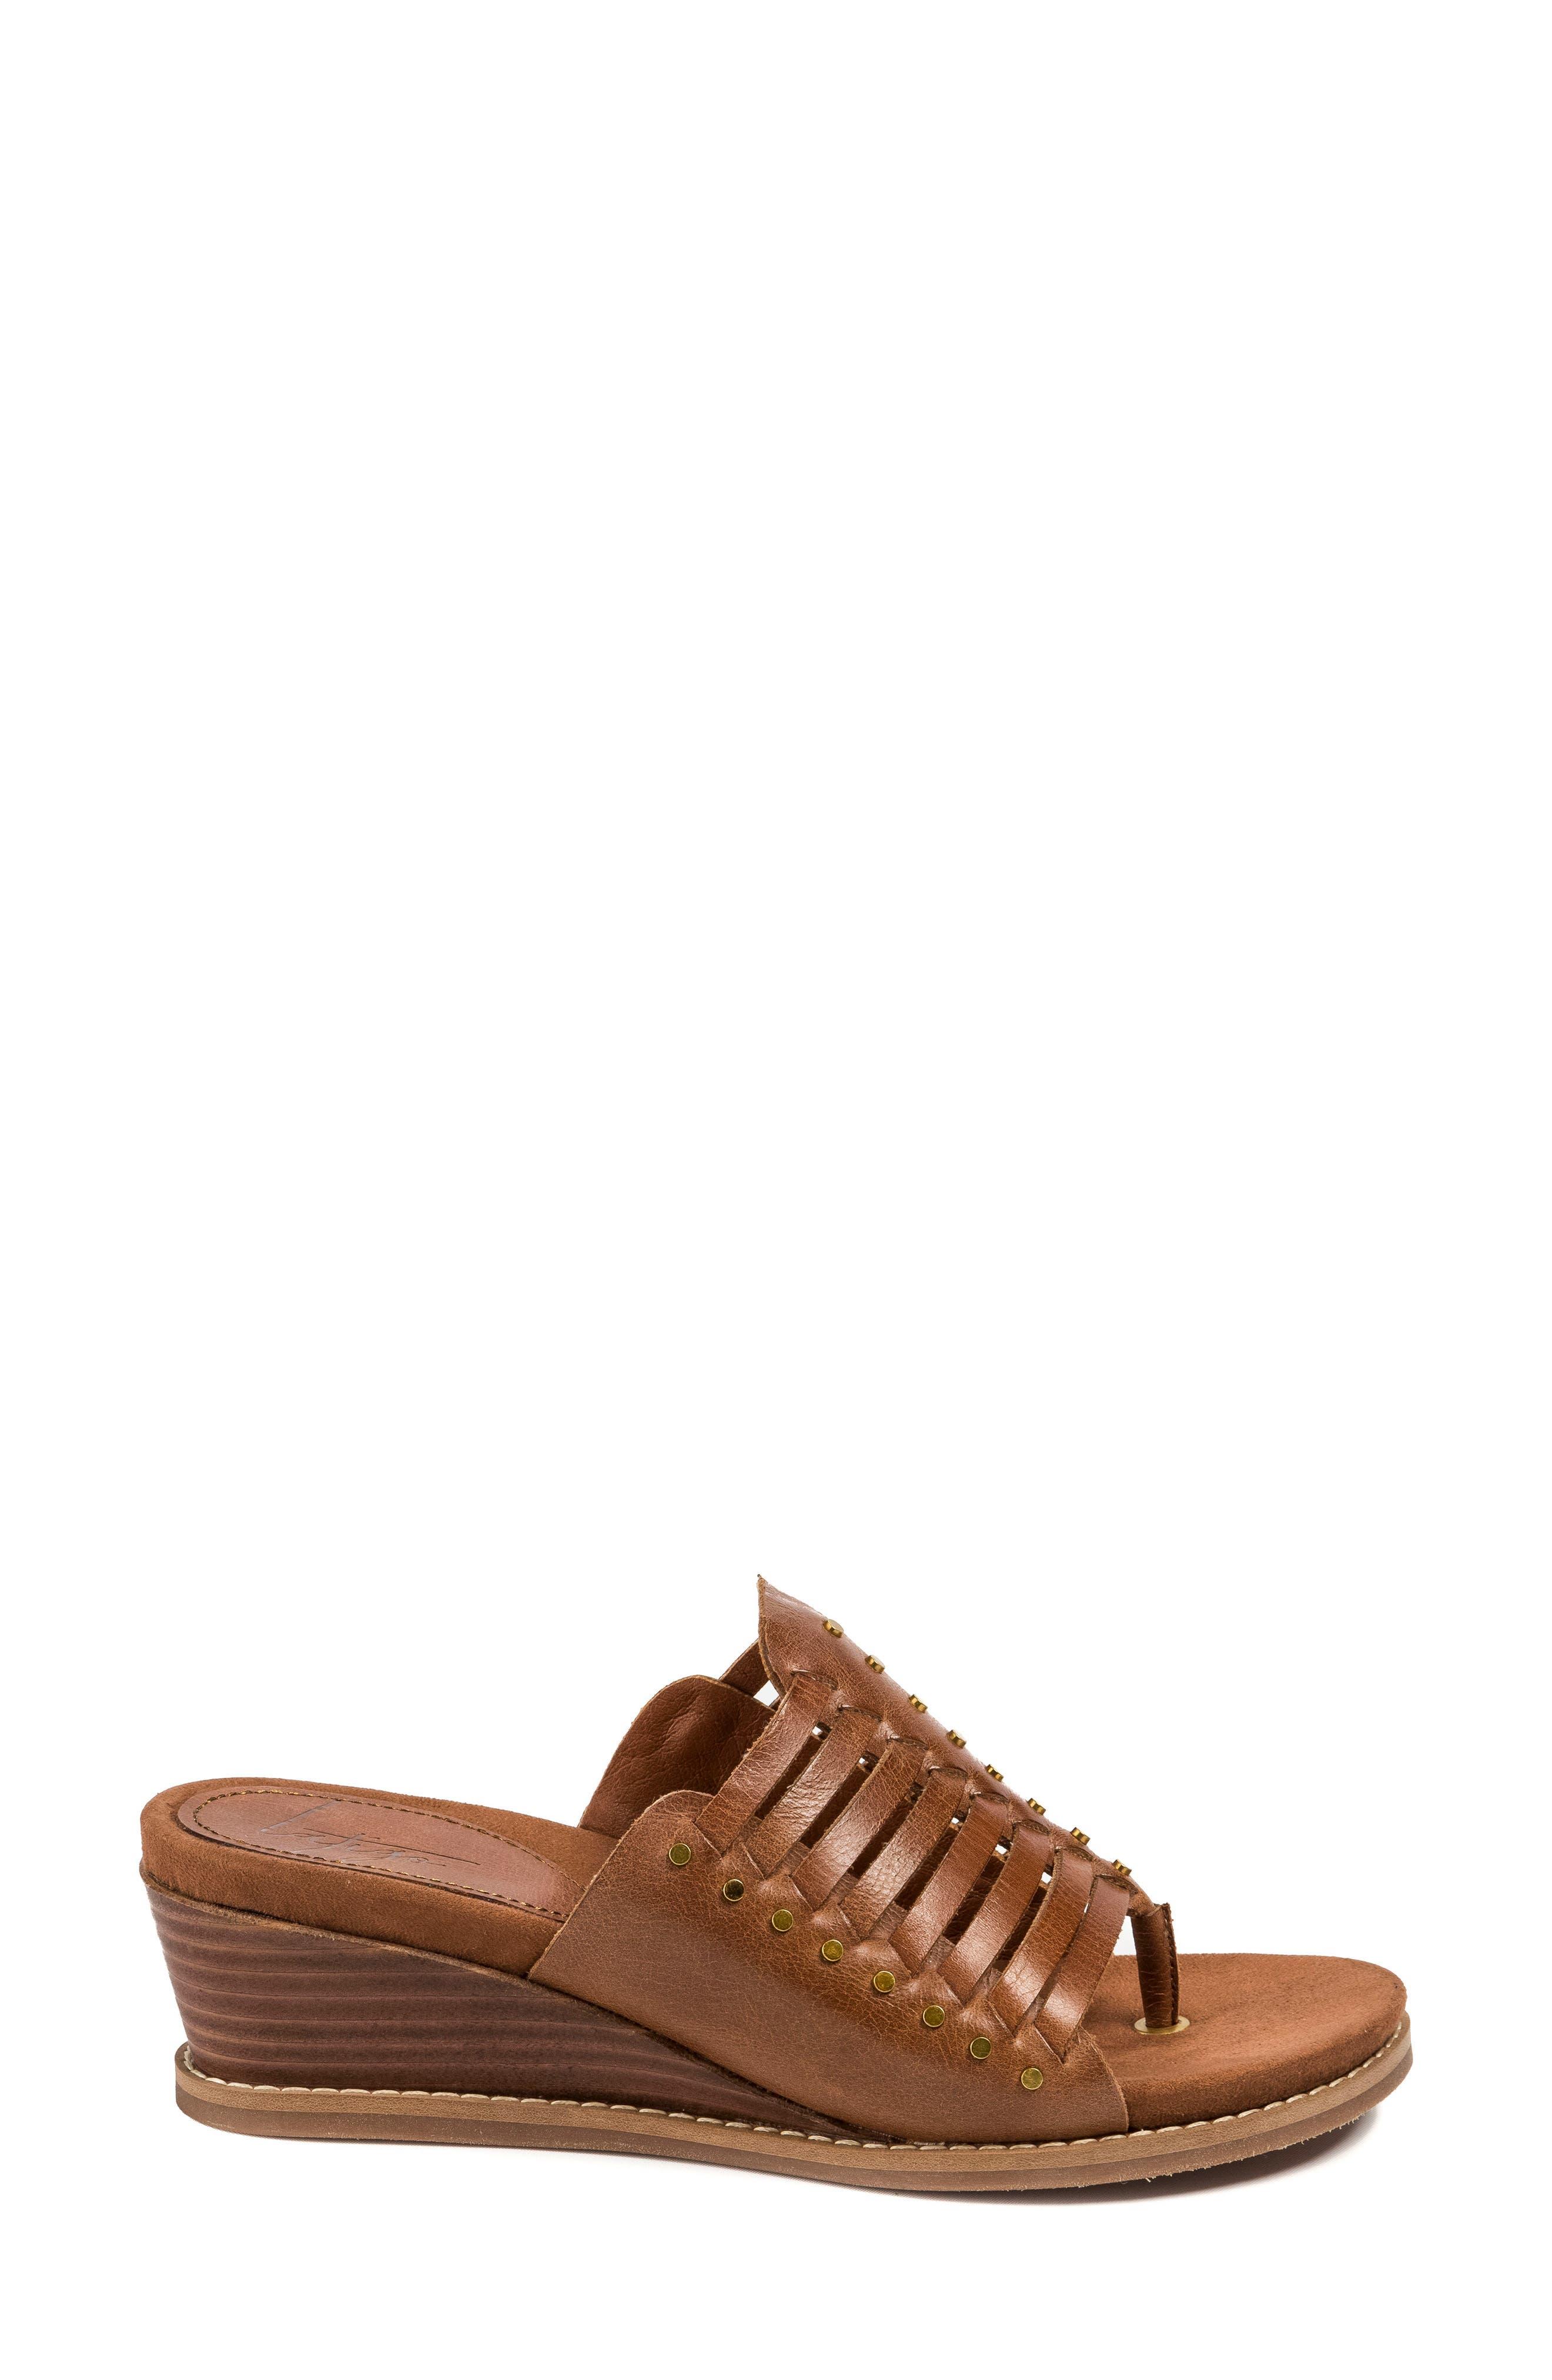 Winnie Wedge Sandal,                             Alternate thumbnail 3, color,                             Brush Brown Leather